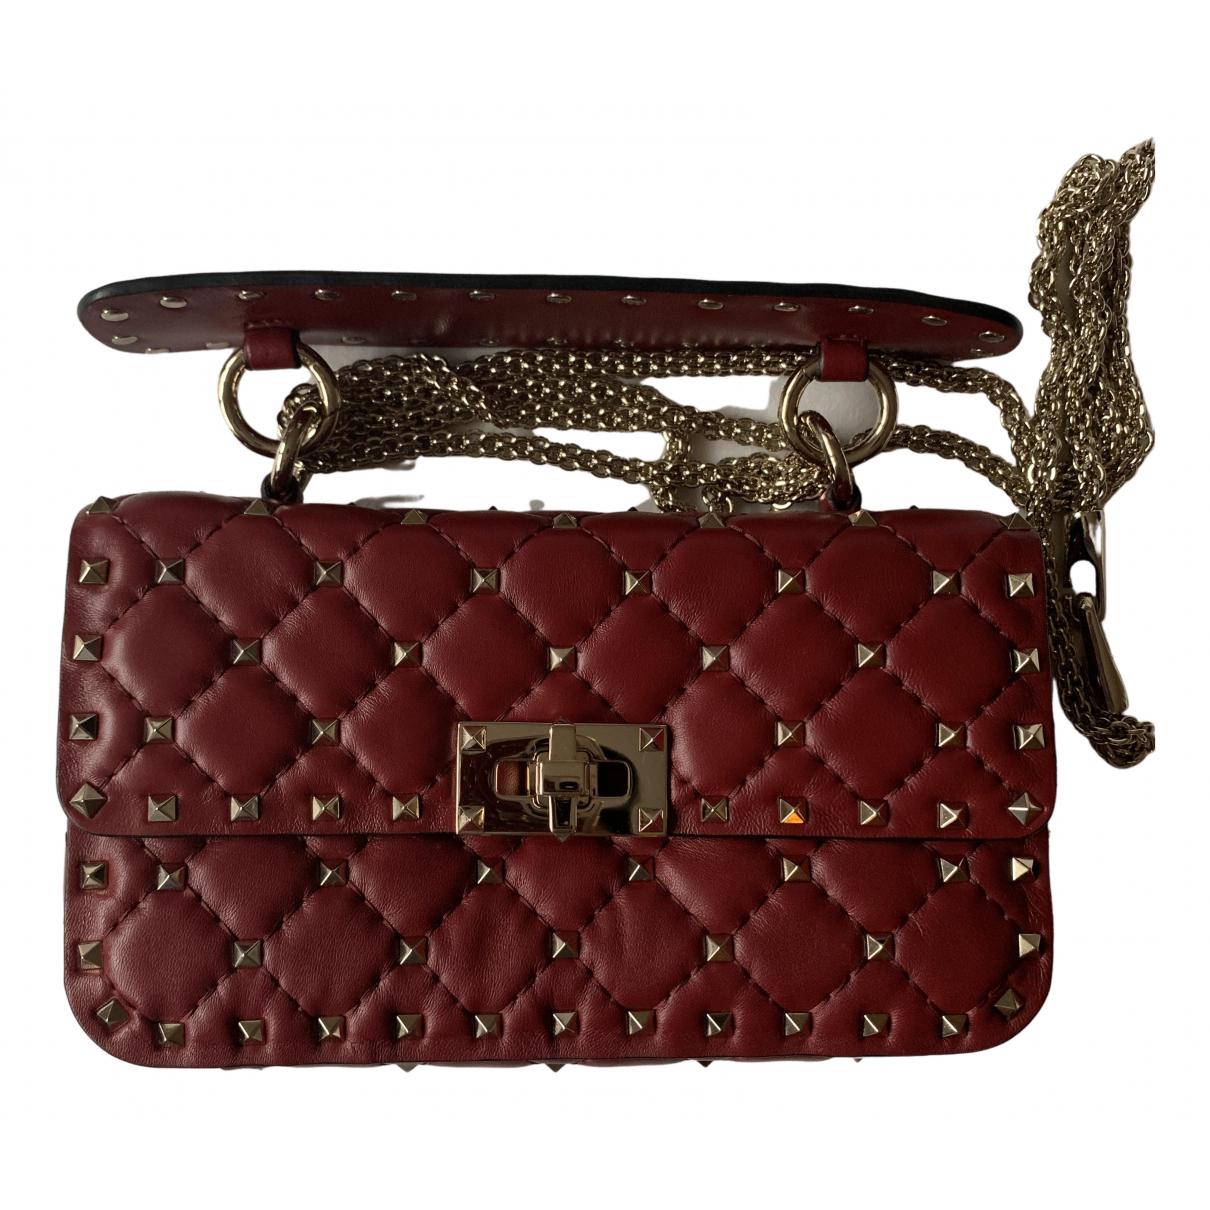 Valentino Garavani Rockstud spike Red Leather handbag for Women N